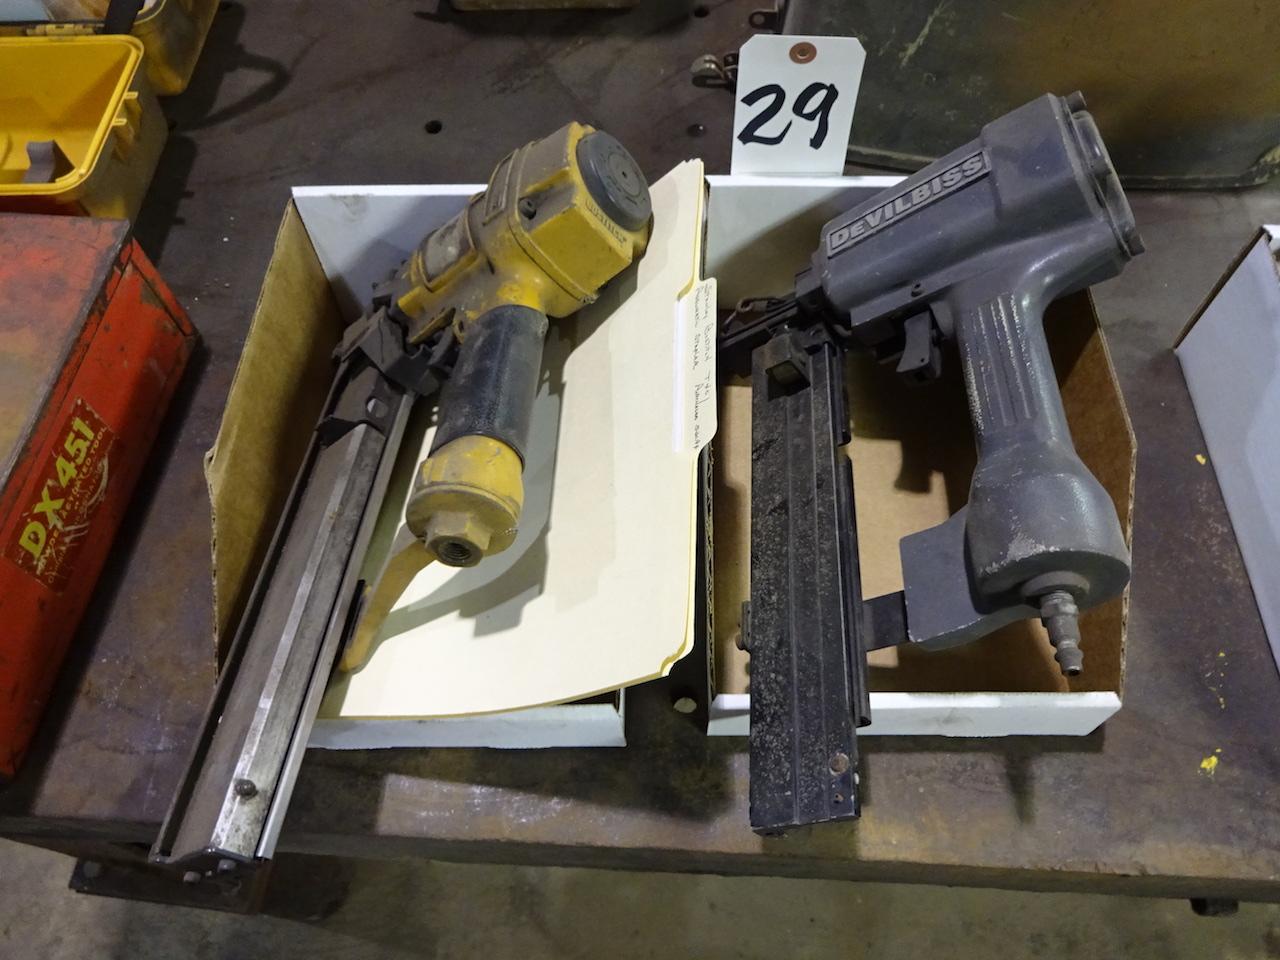 Lot 29 - LOT: Devilbiss & Stanley Bostitch Pneumatic Staple Guns